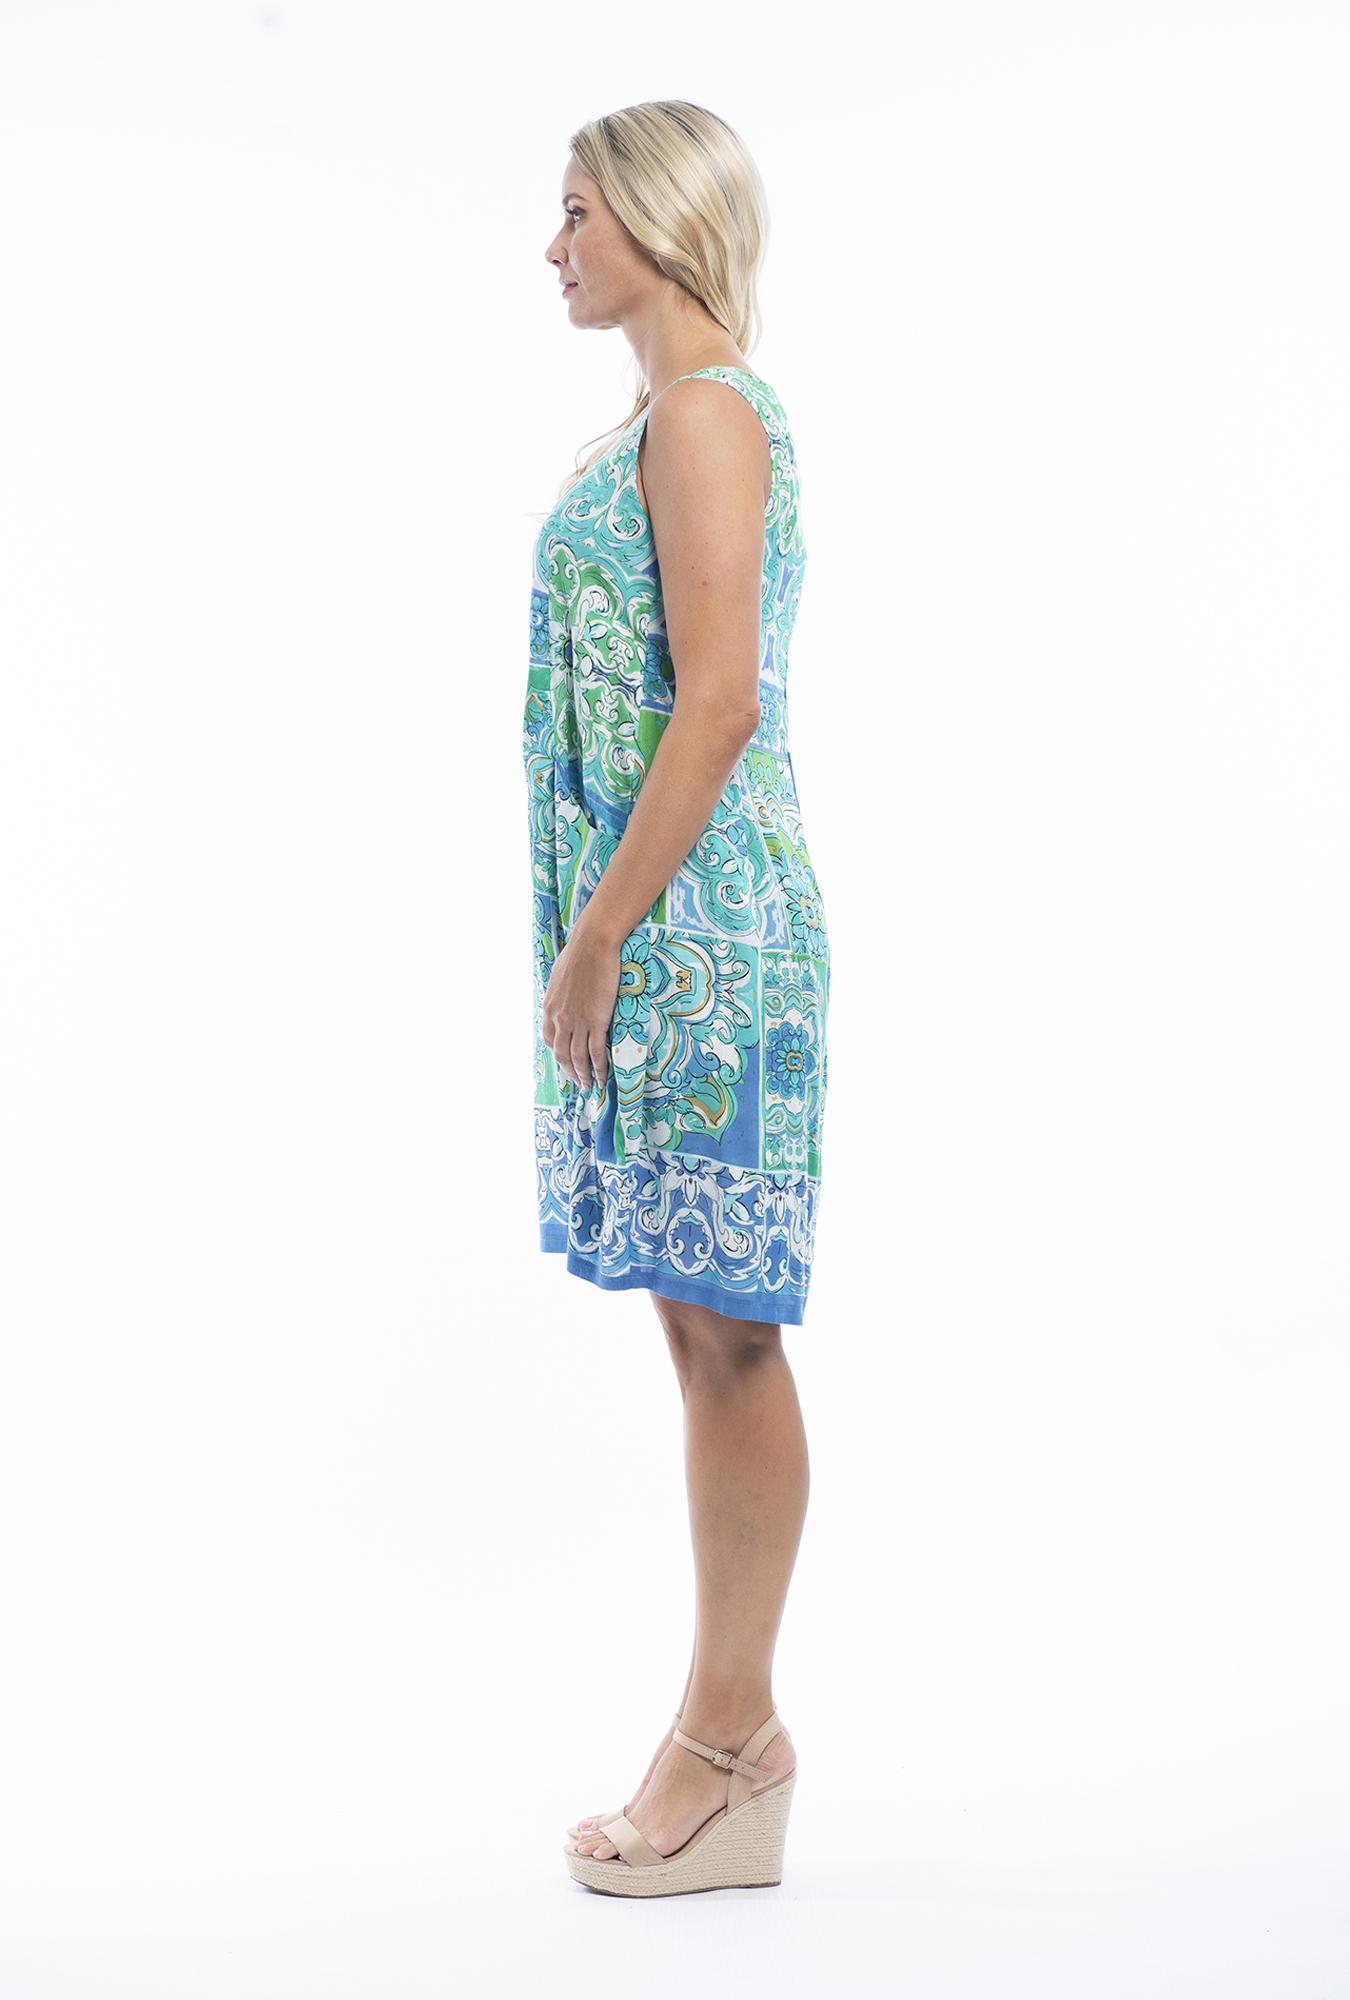 Orla Bubble Dress in Mauresque Green